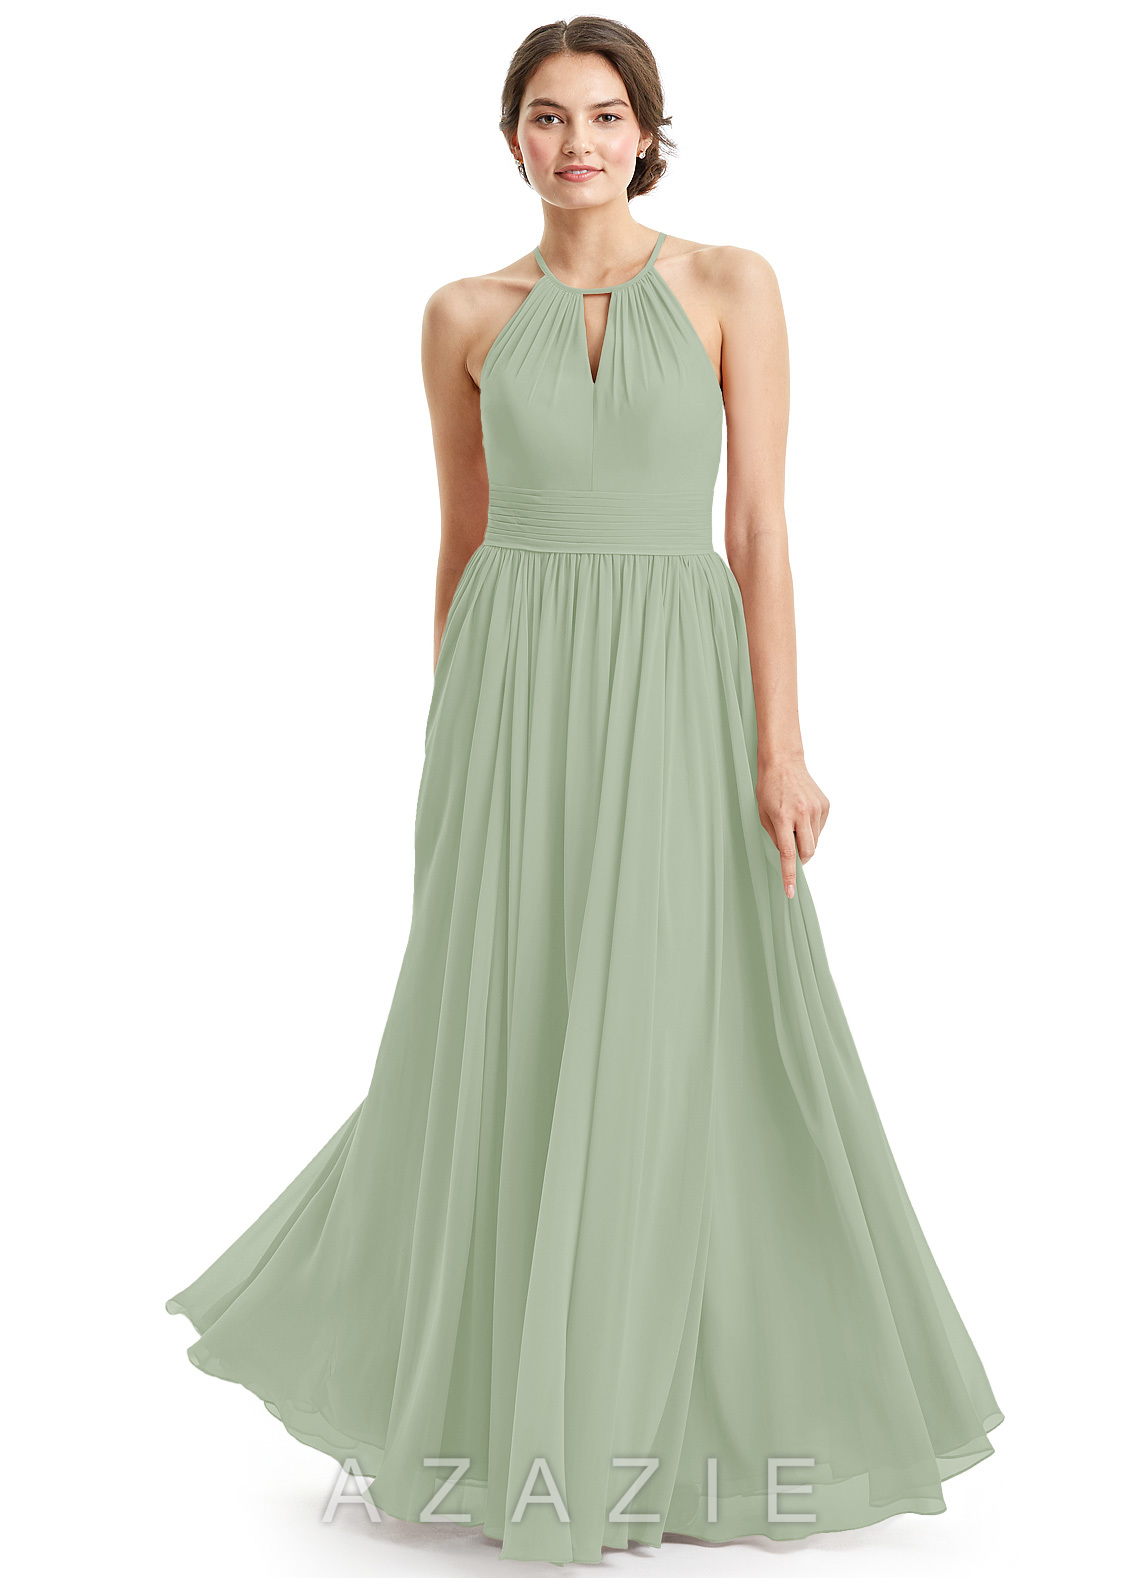 Dusty sage bridesmaid dresses dusty sage gowns azazie azazie cherish azazie cherish ombrellifo Choice Image